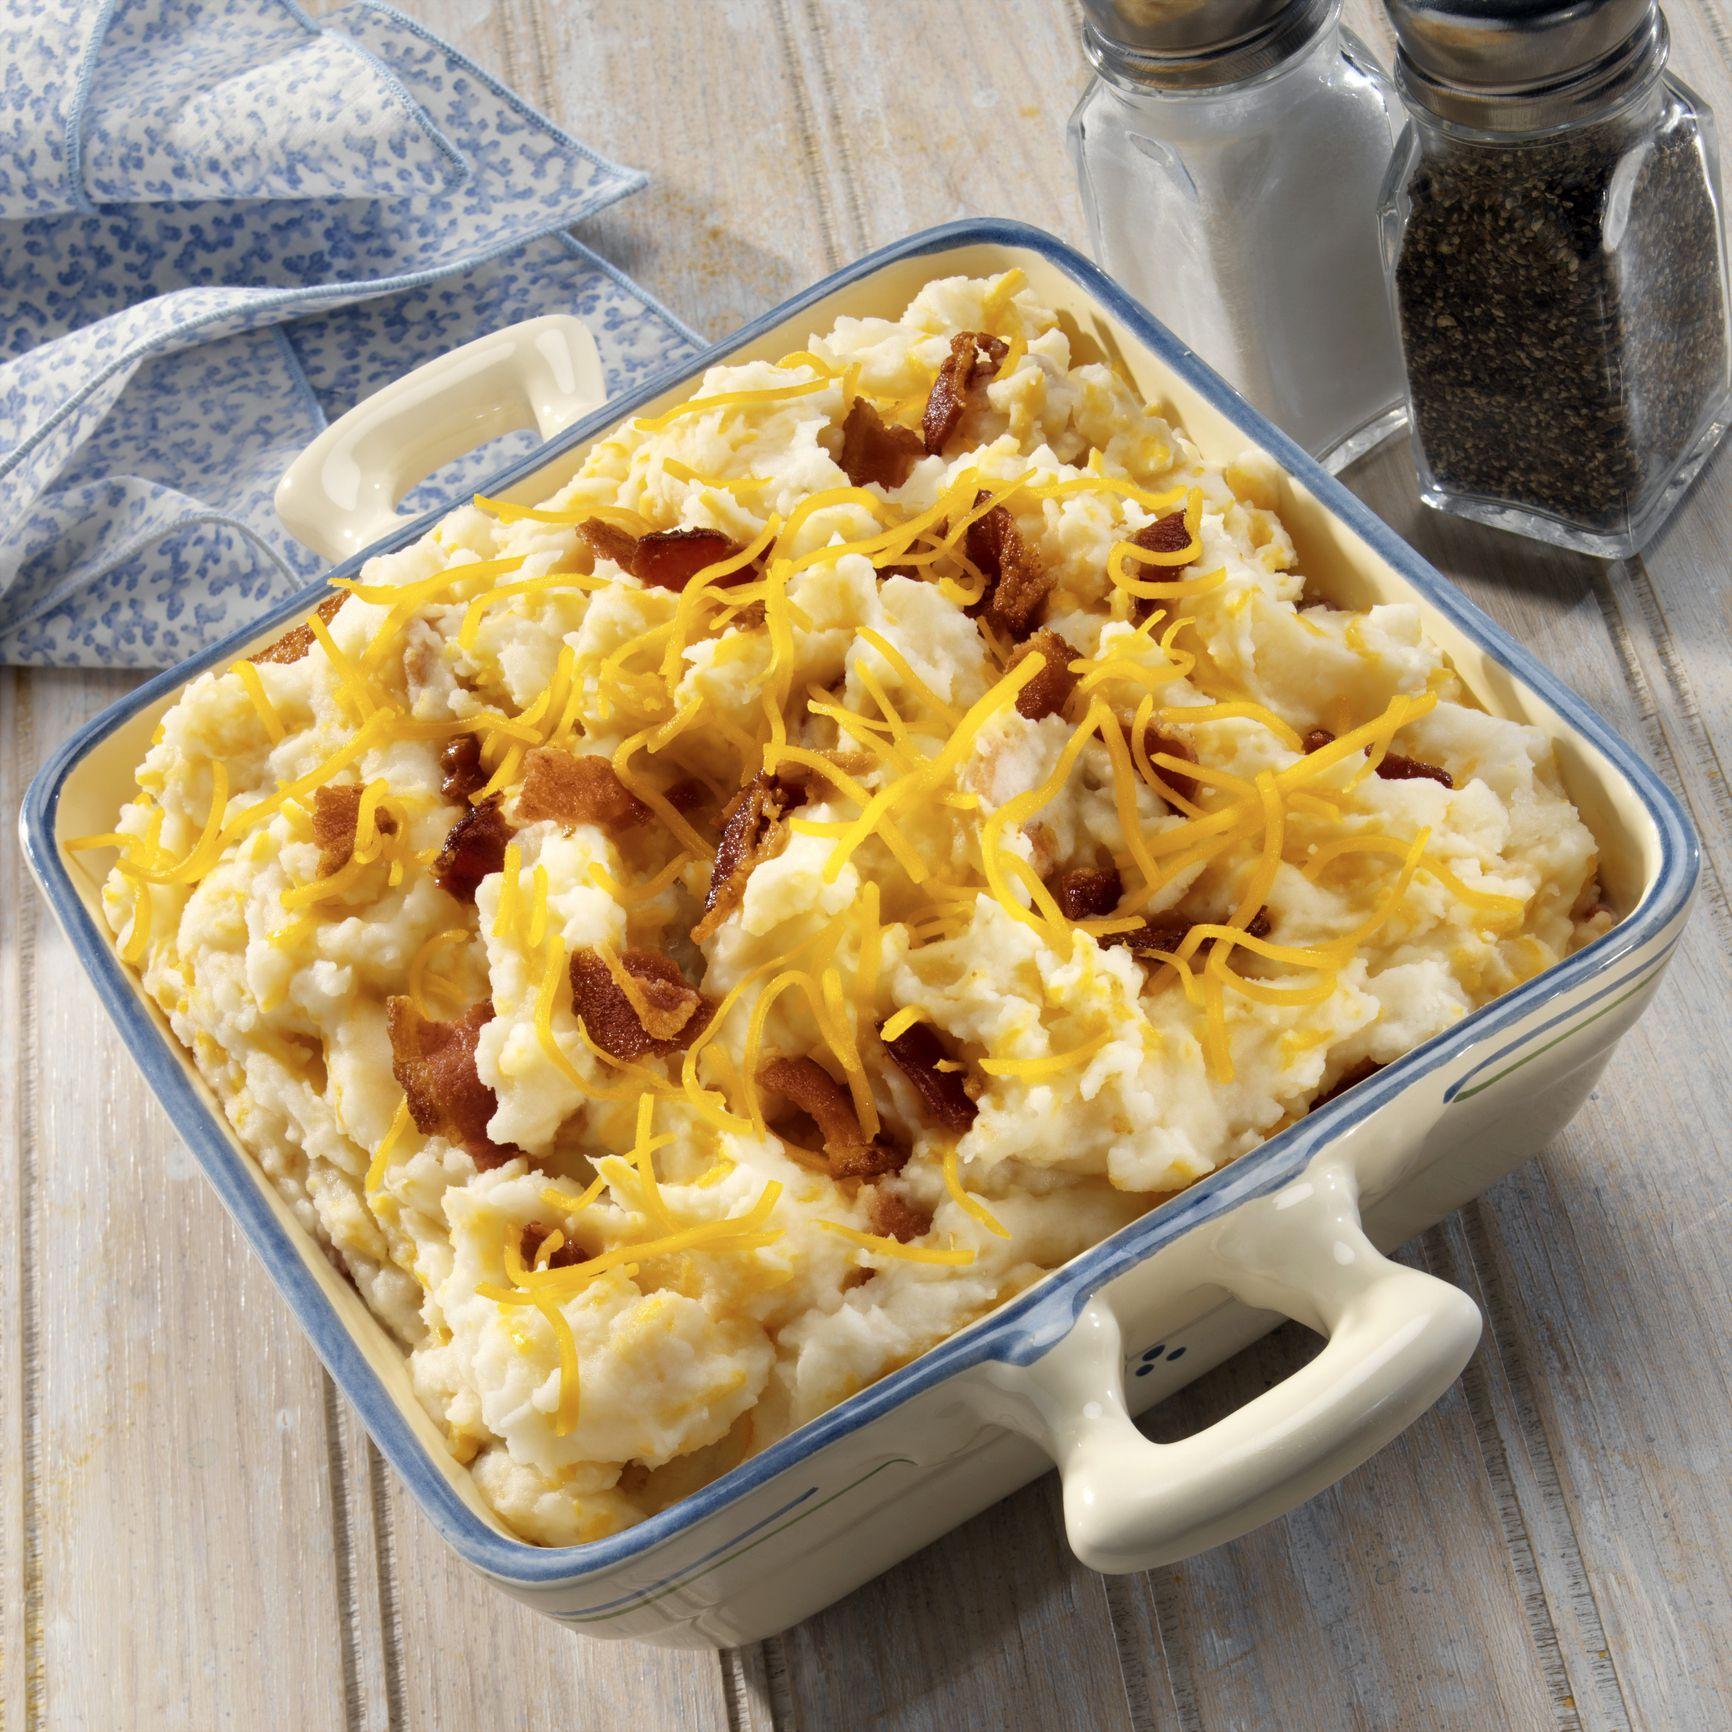 Heavenly Loaded Mashed Potato Casserole